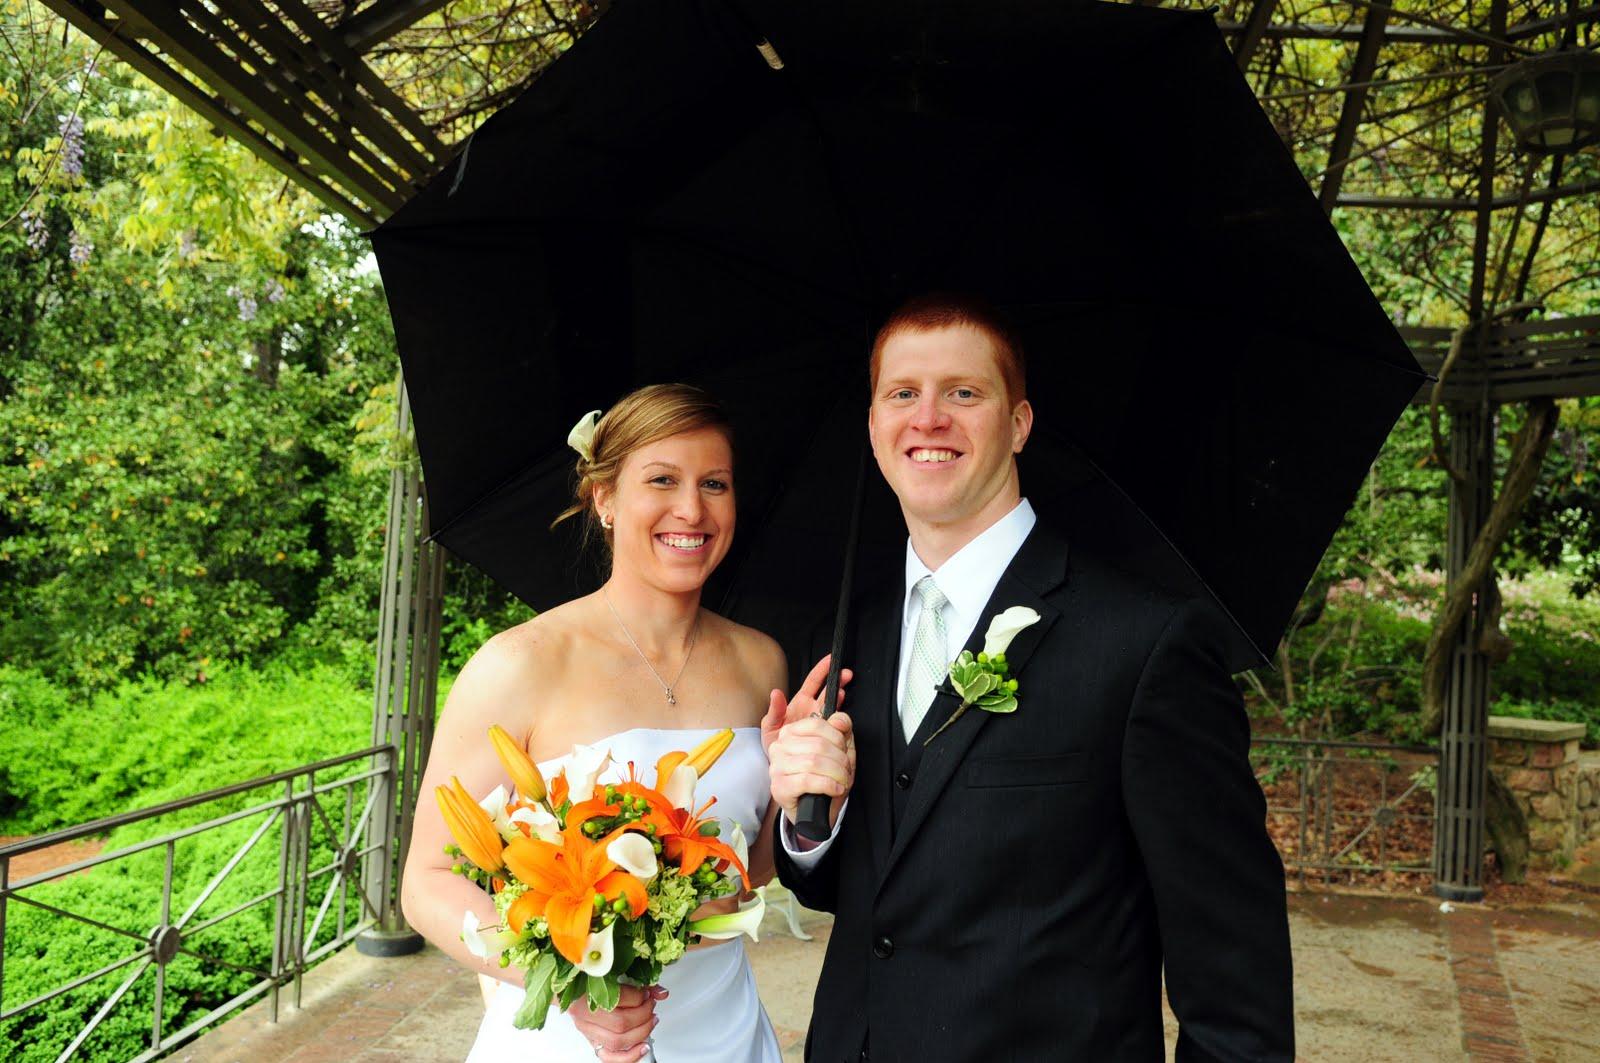 nc triangle weddings blog 6 key tips on how to keep rain